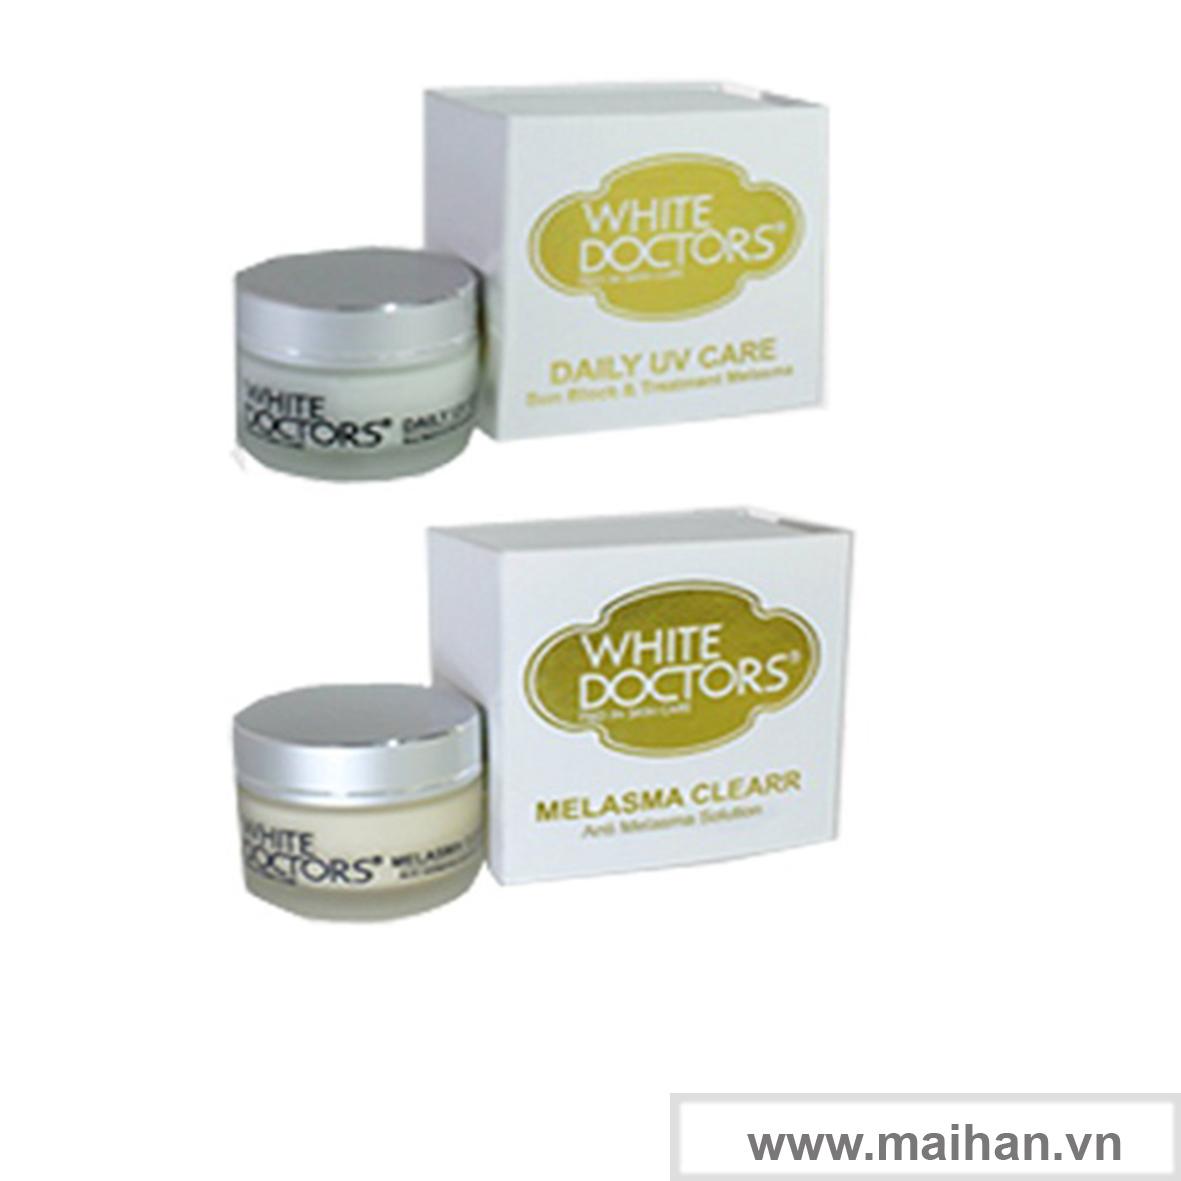 Bộ đôi  hỗ trợ điều trị nám da của White Doctors - Daily UV Care & Melasma Clearr